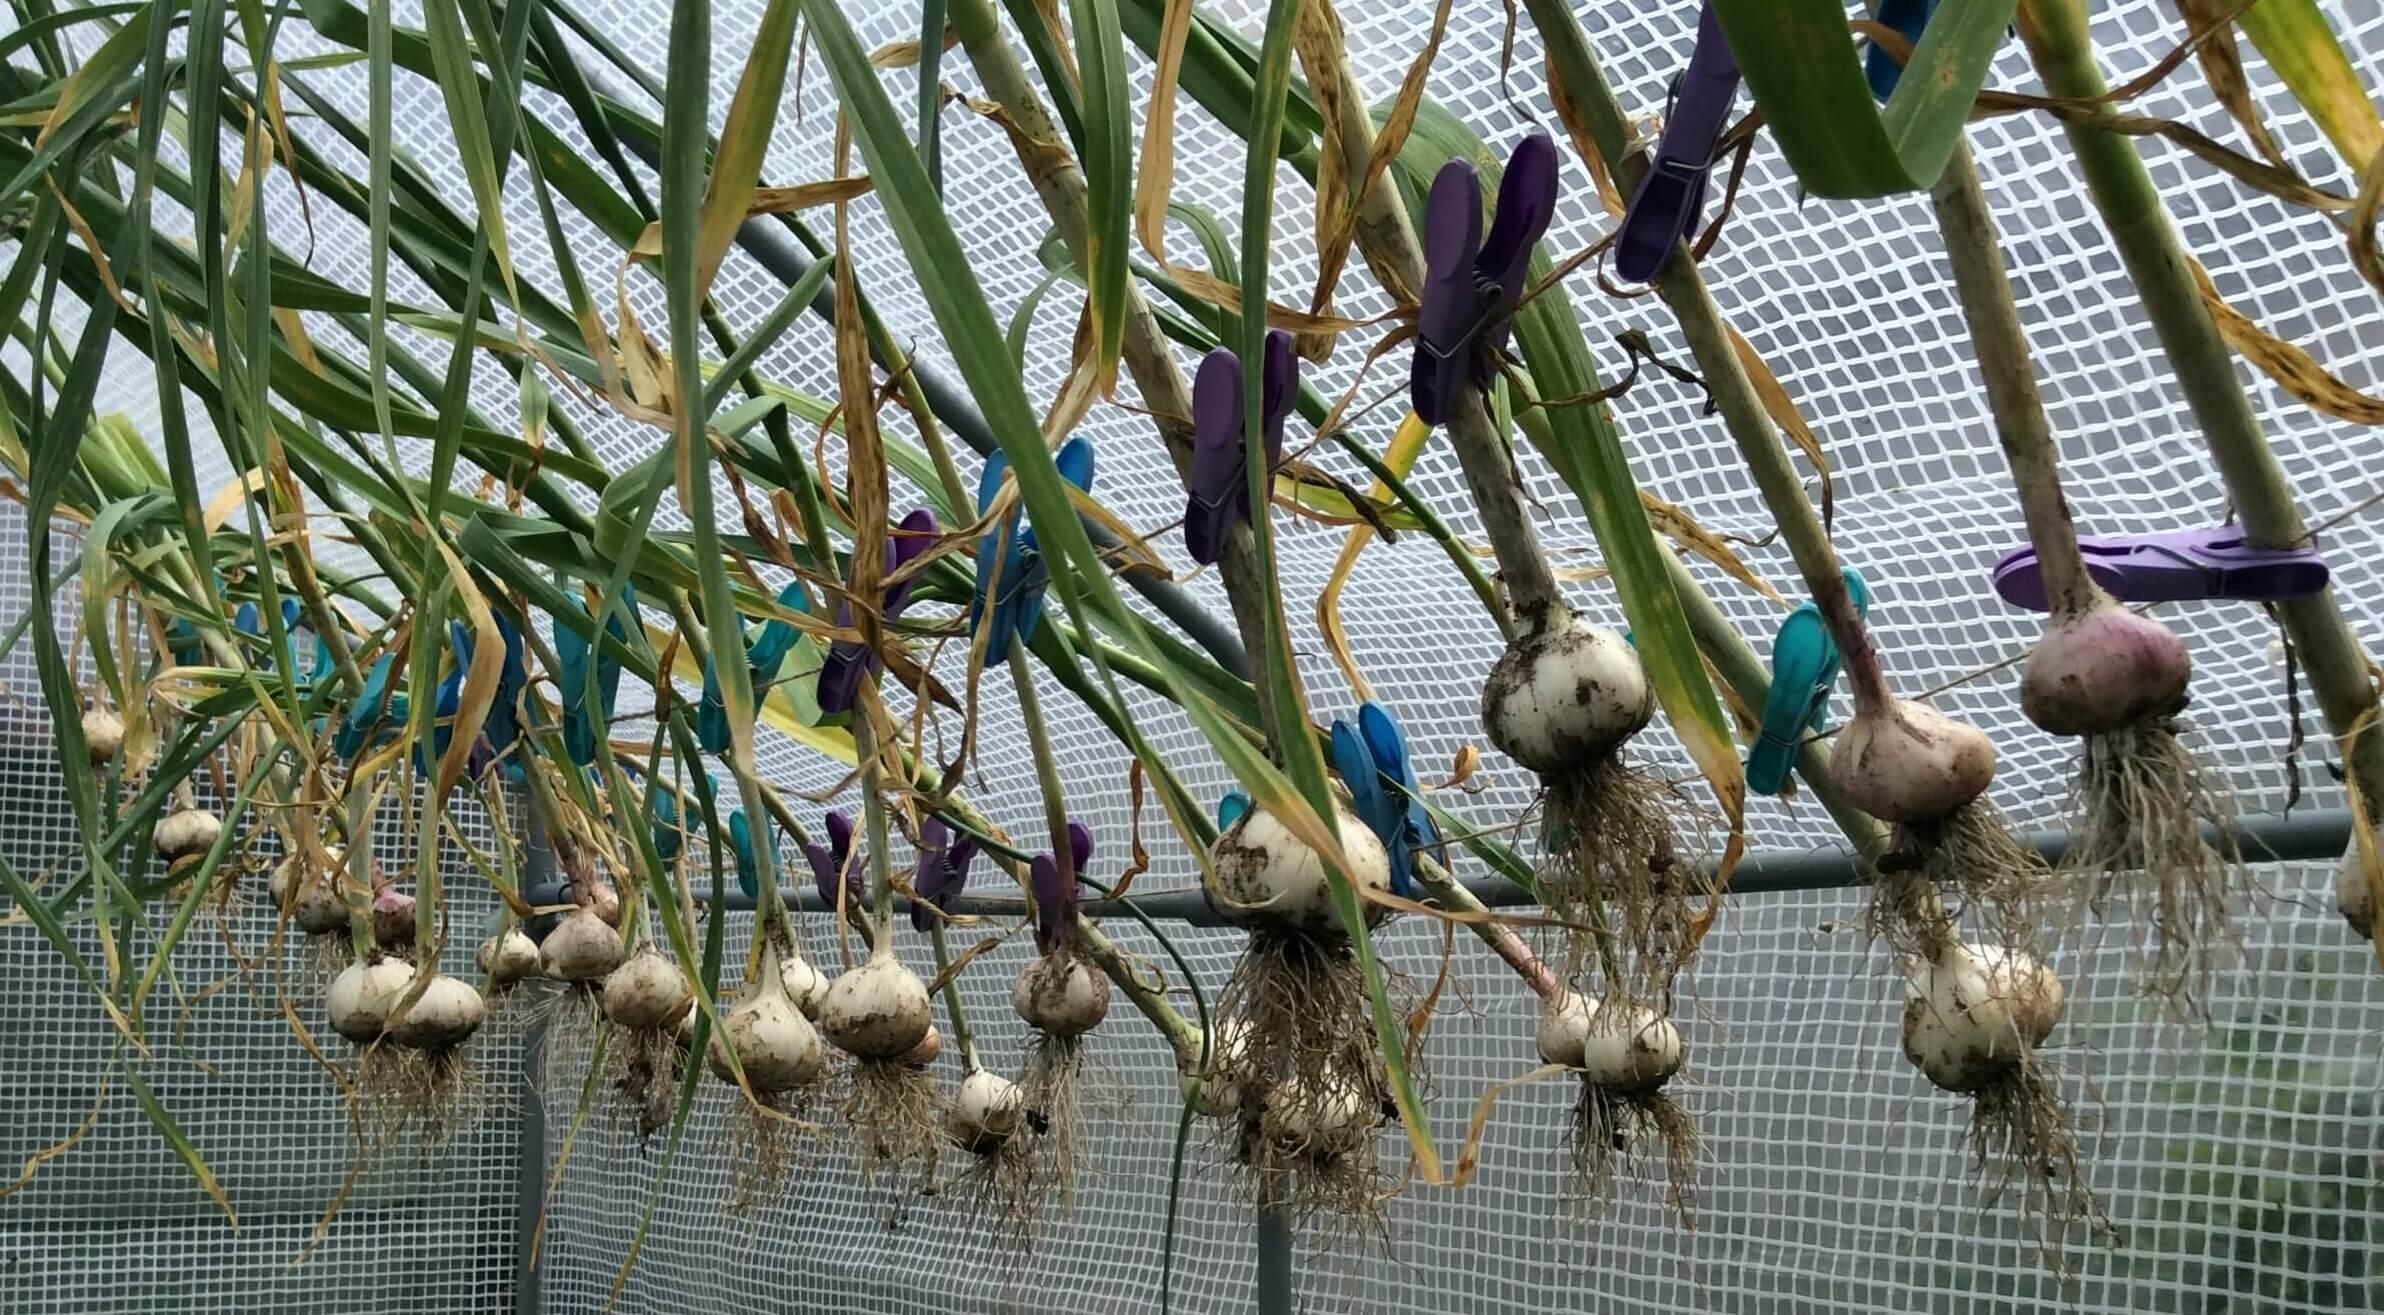 Garlicdrying